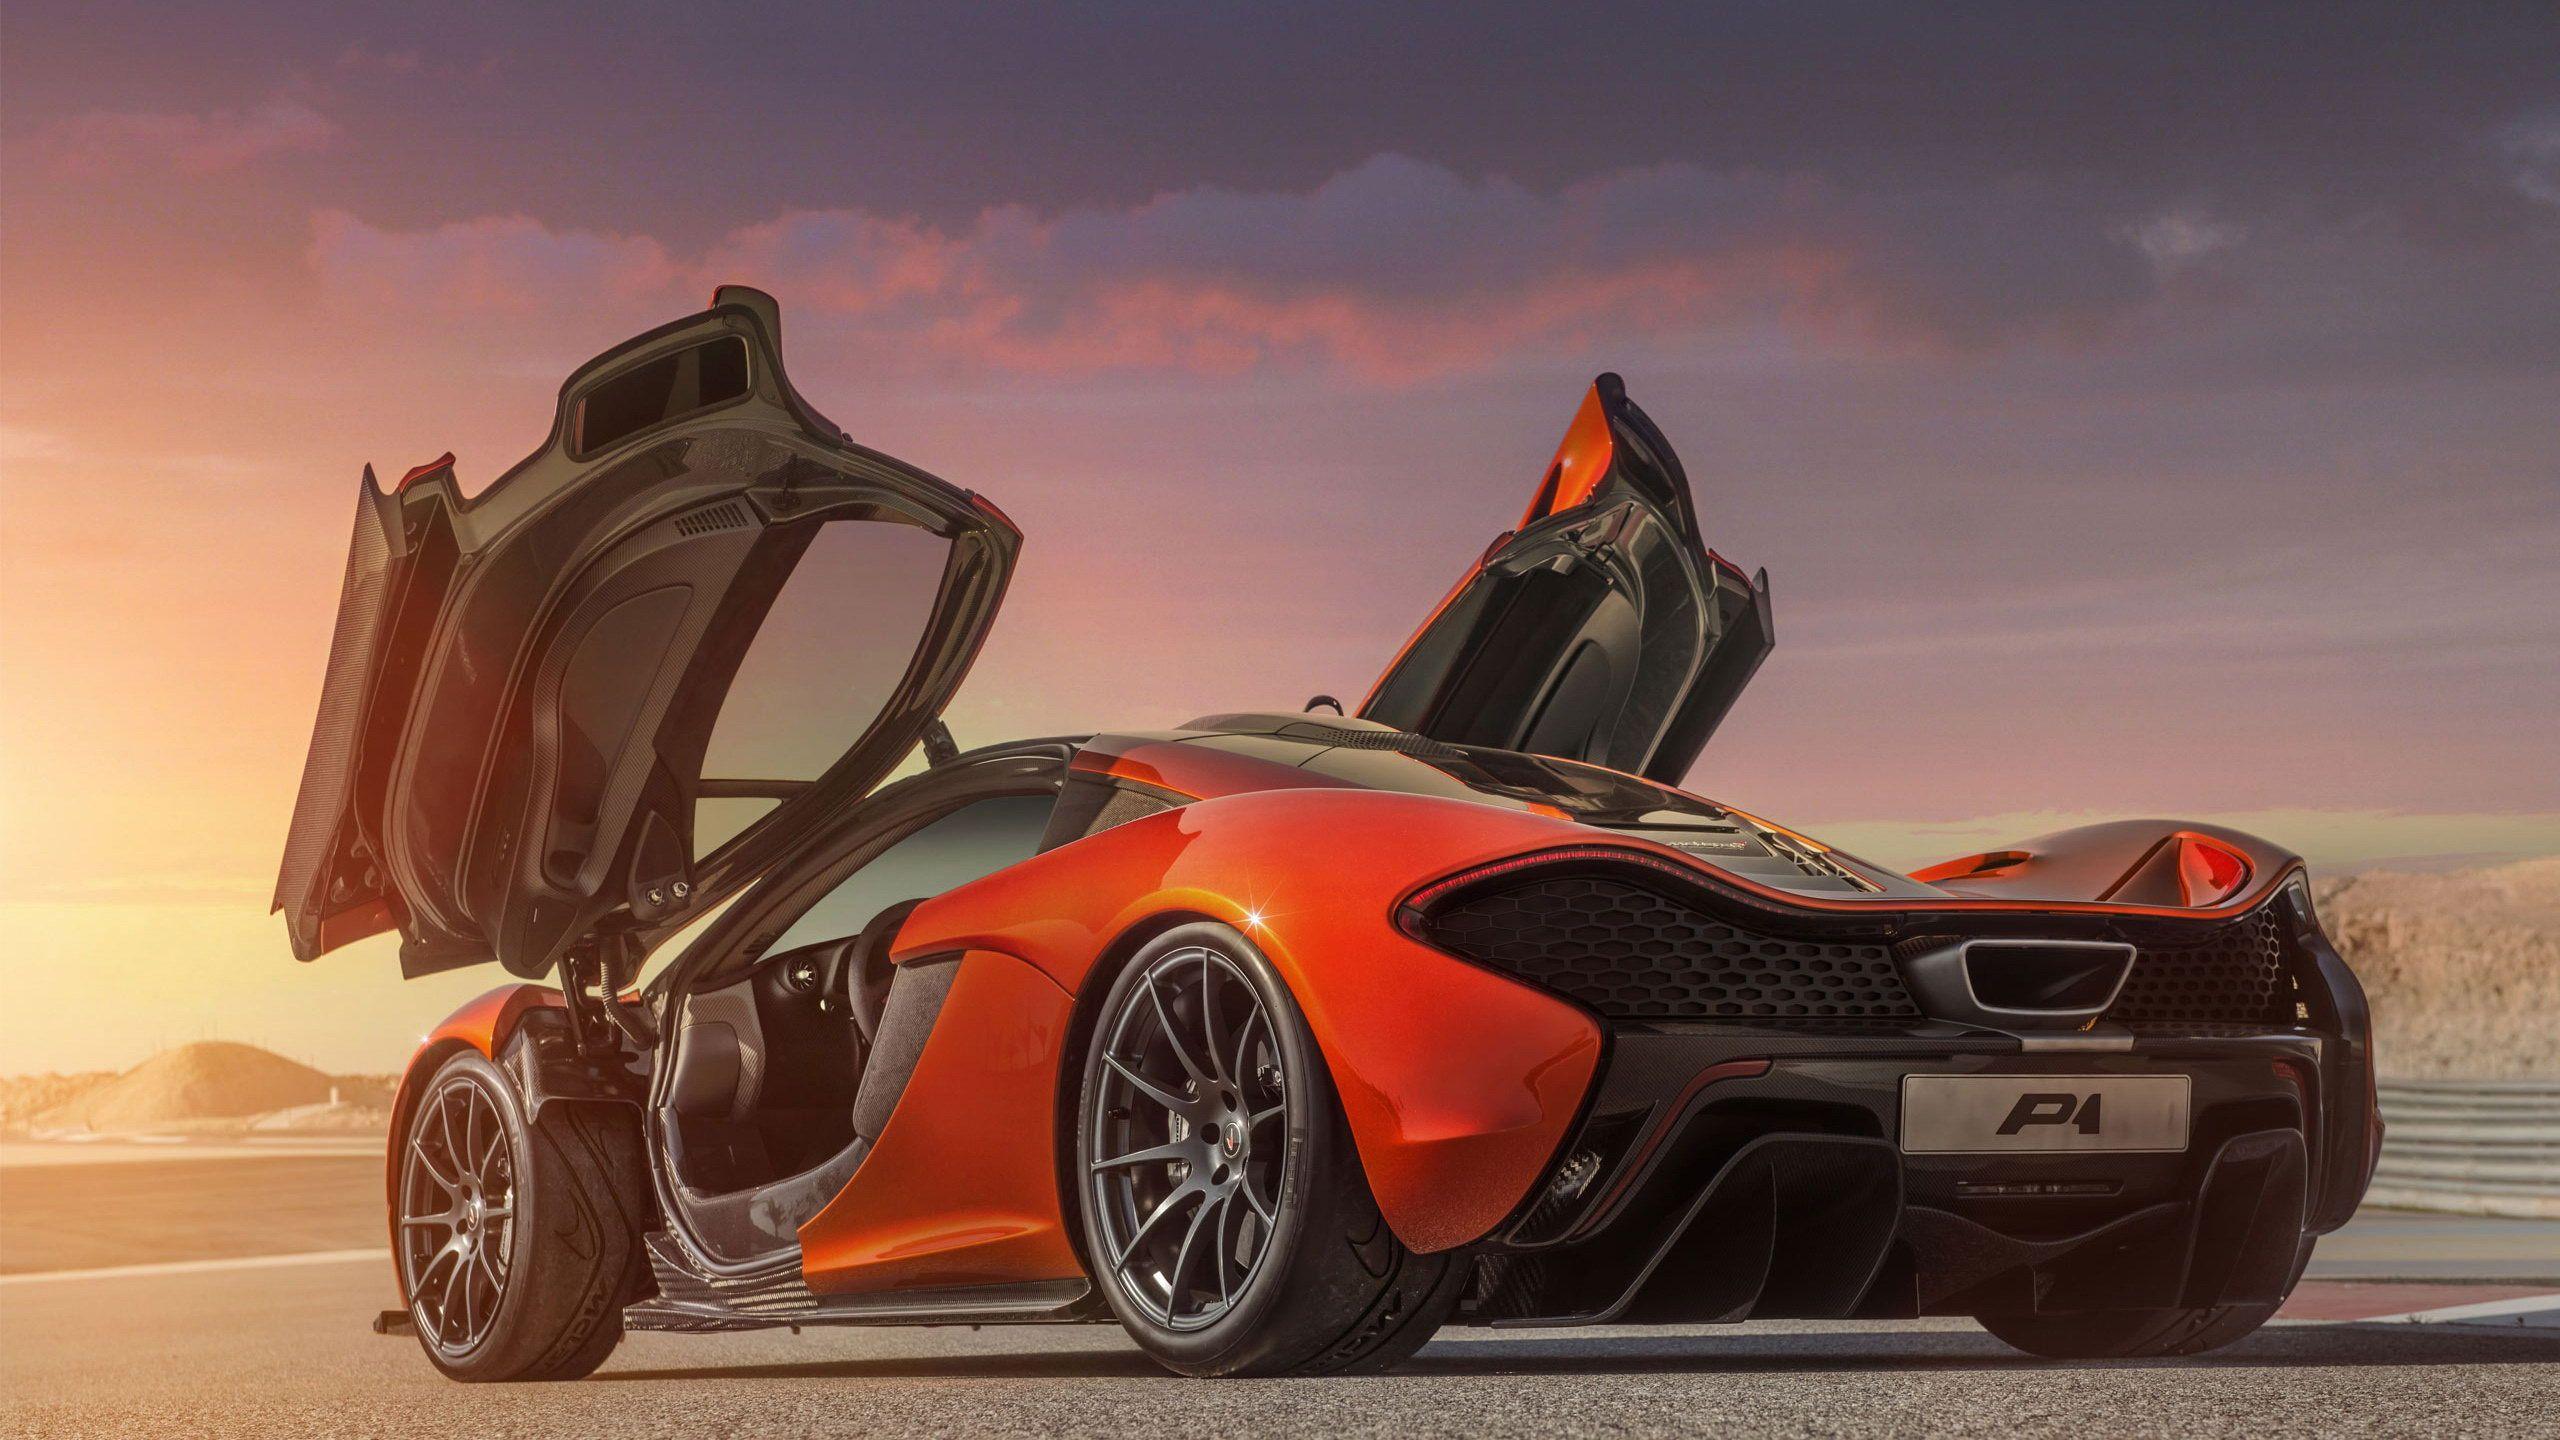 McLaren P1 Neon Energy Crystal City Car 2014 | Fast Cars McLaren P1 |  Pinterest | Mclaren P1 And City Car